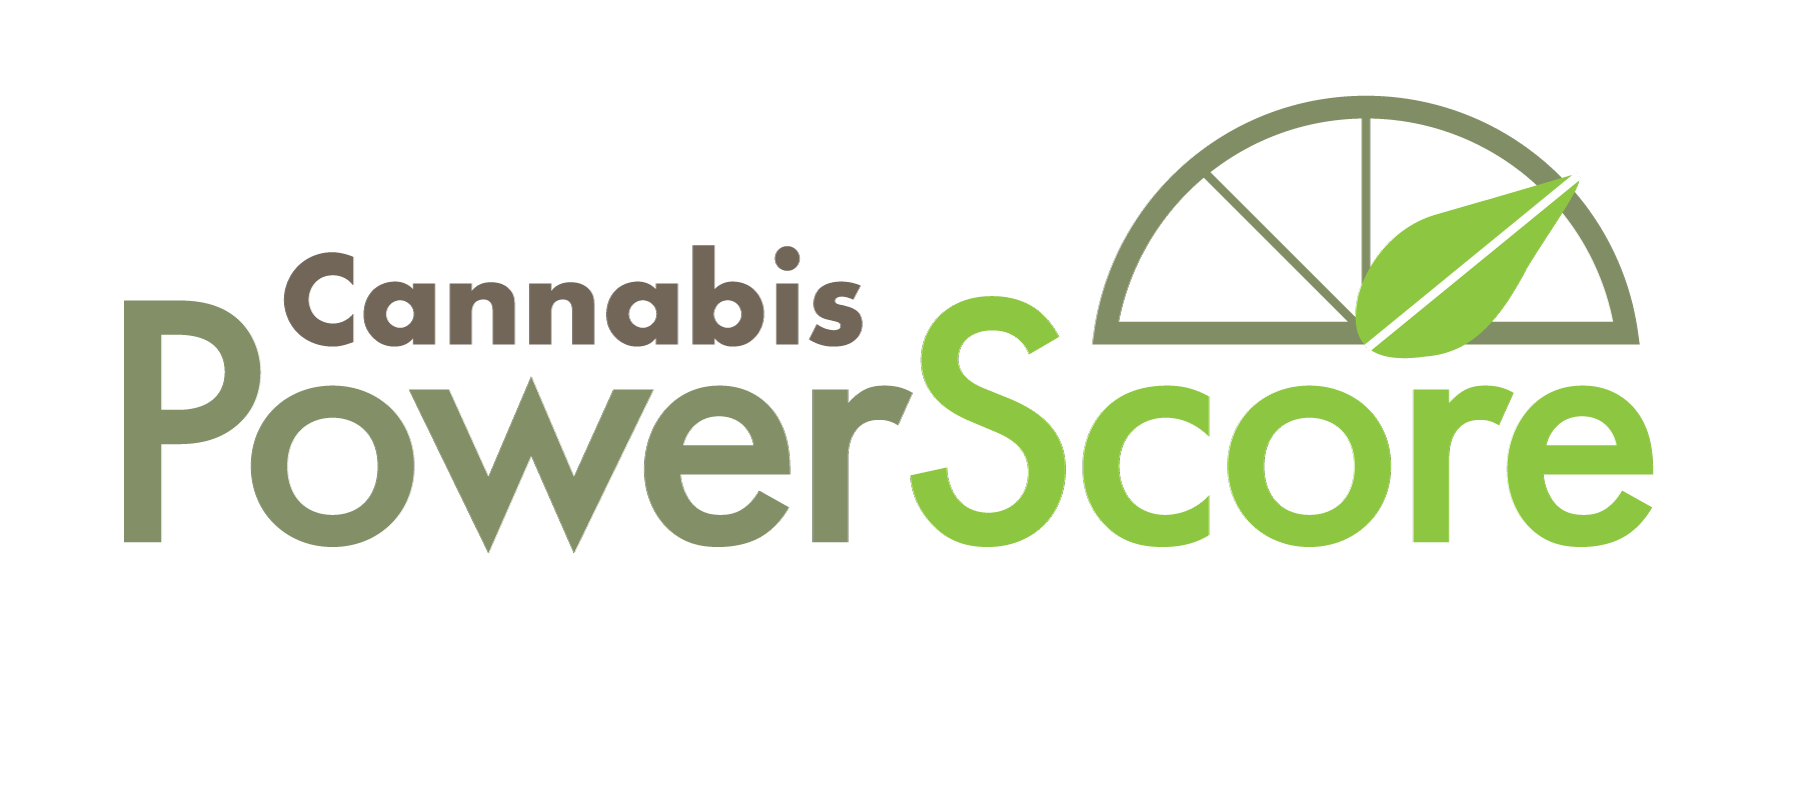 Cannabis PowerScore